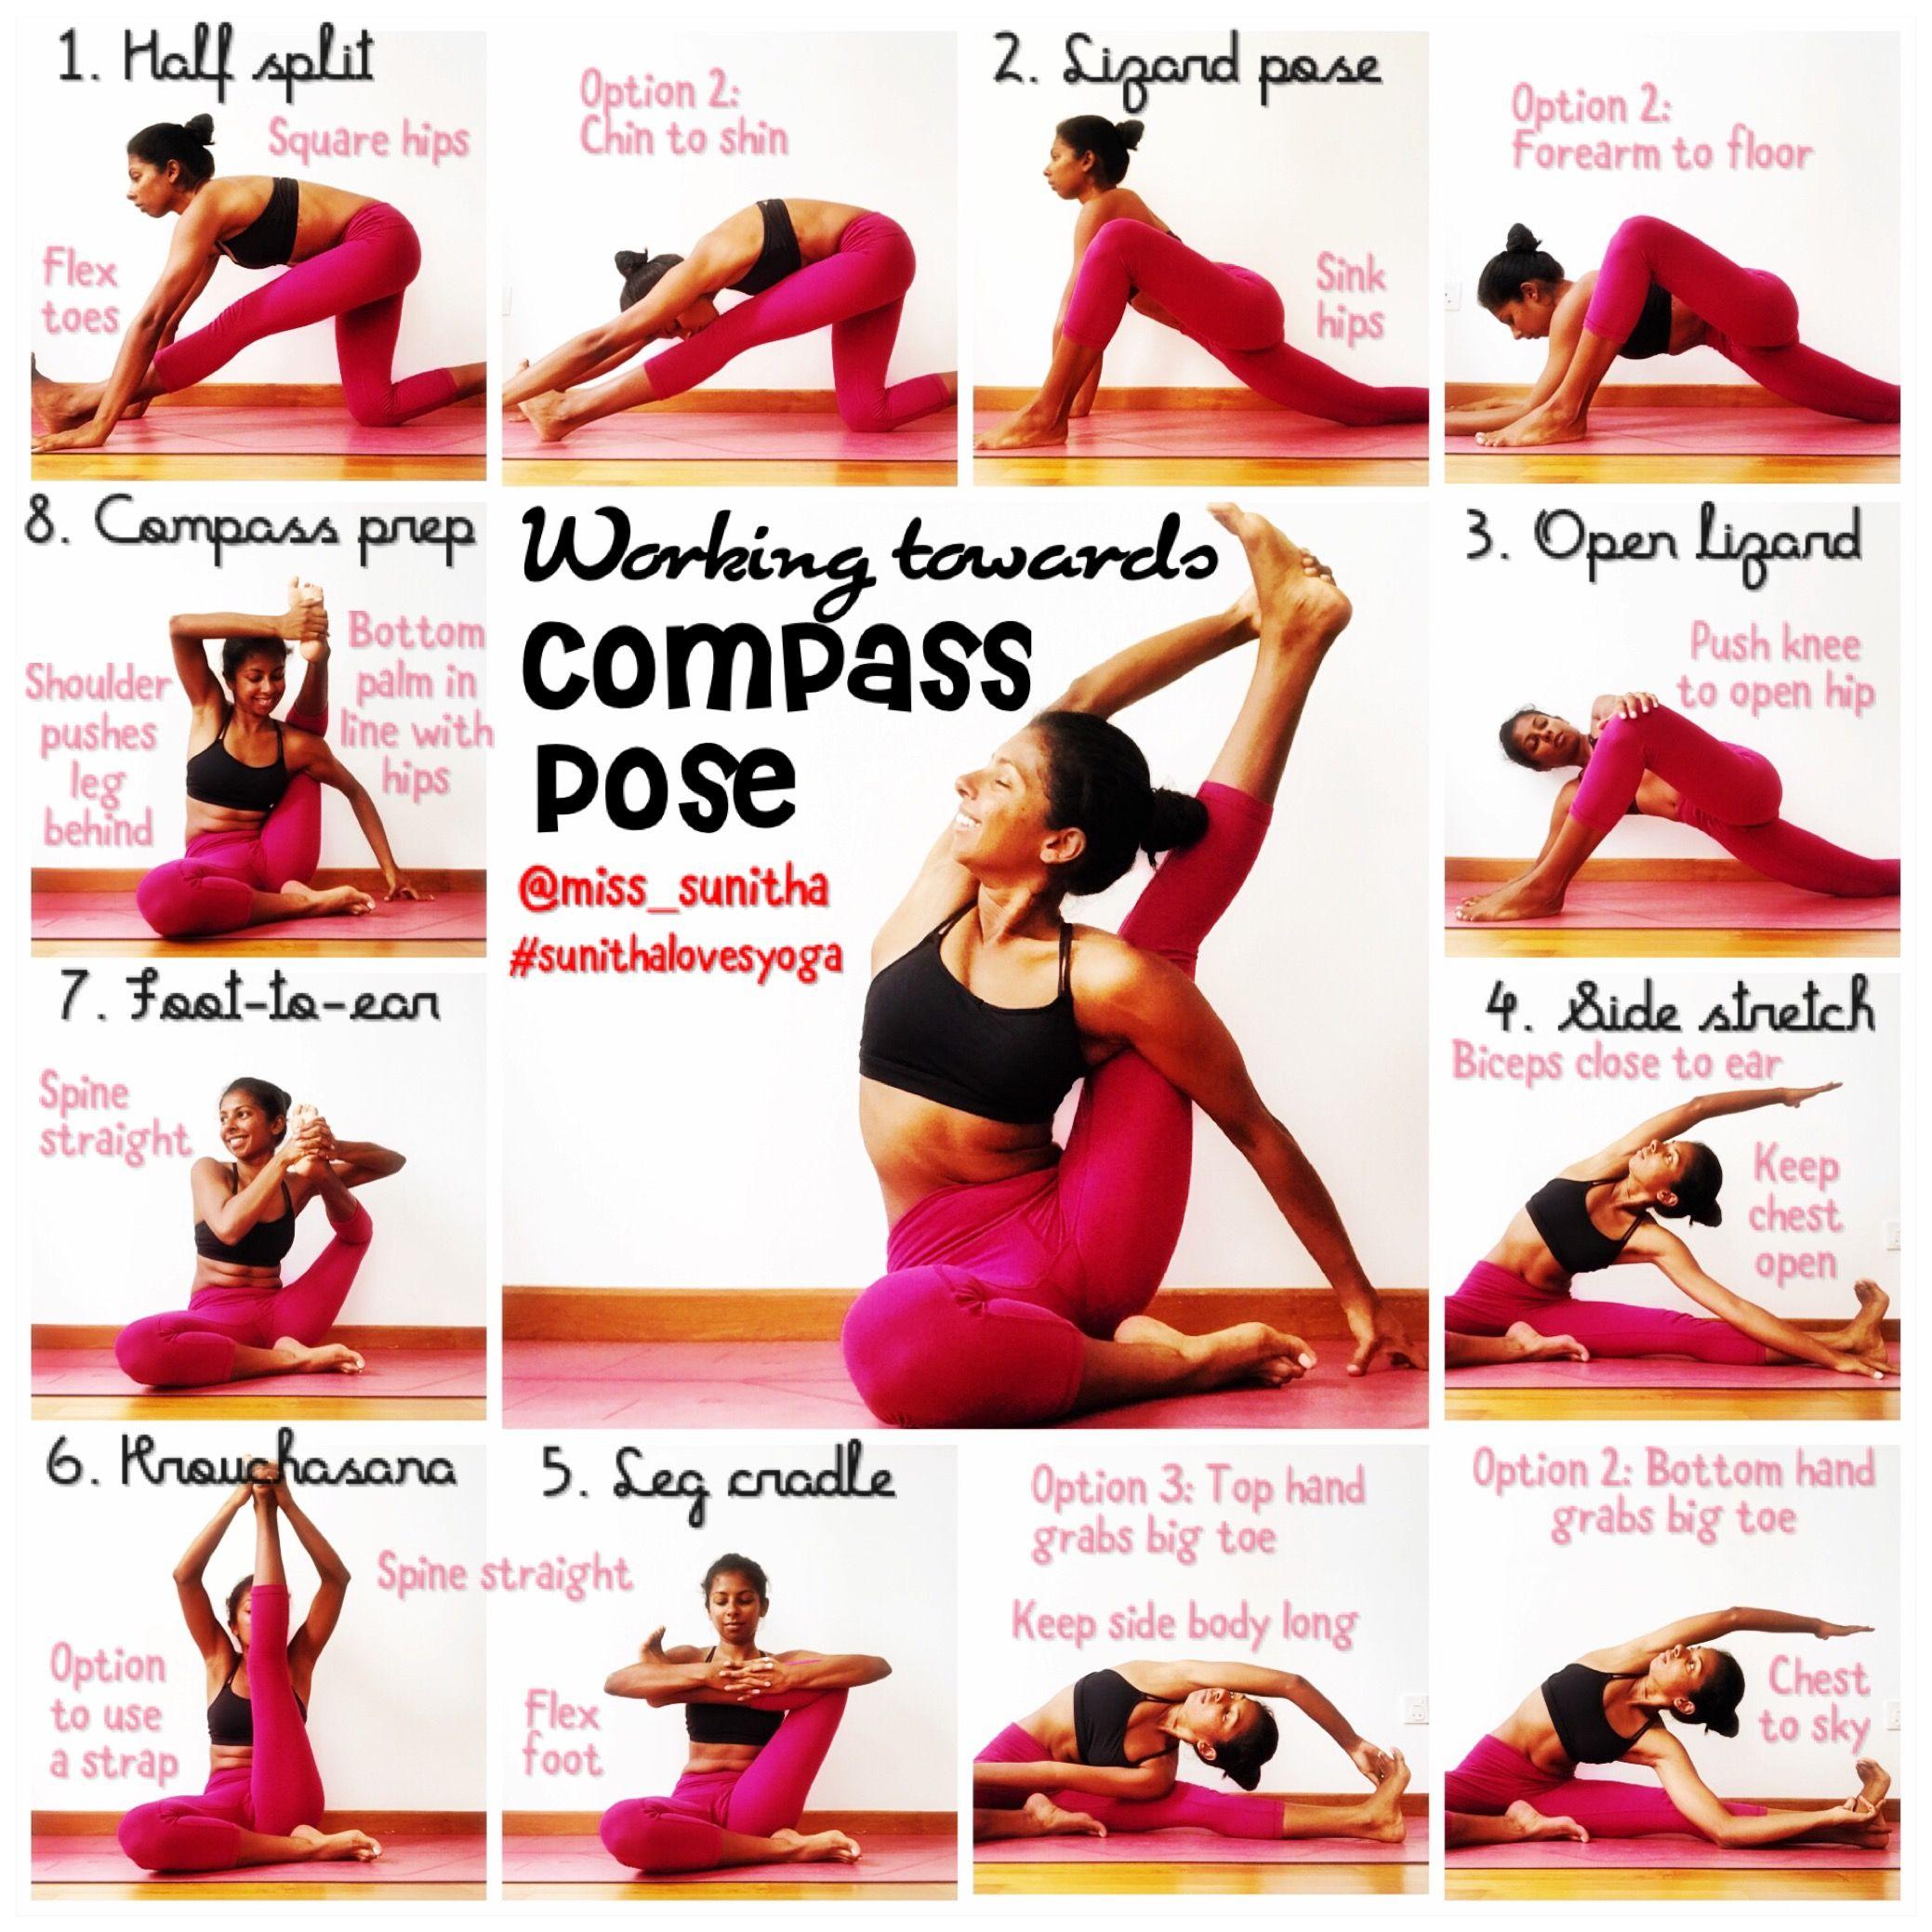 Yoga tutorial for compass pose - hip openers. @miss_sunitha